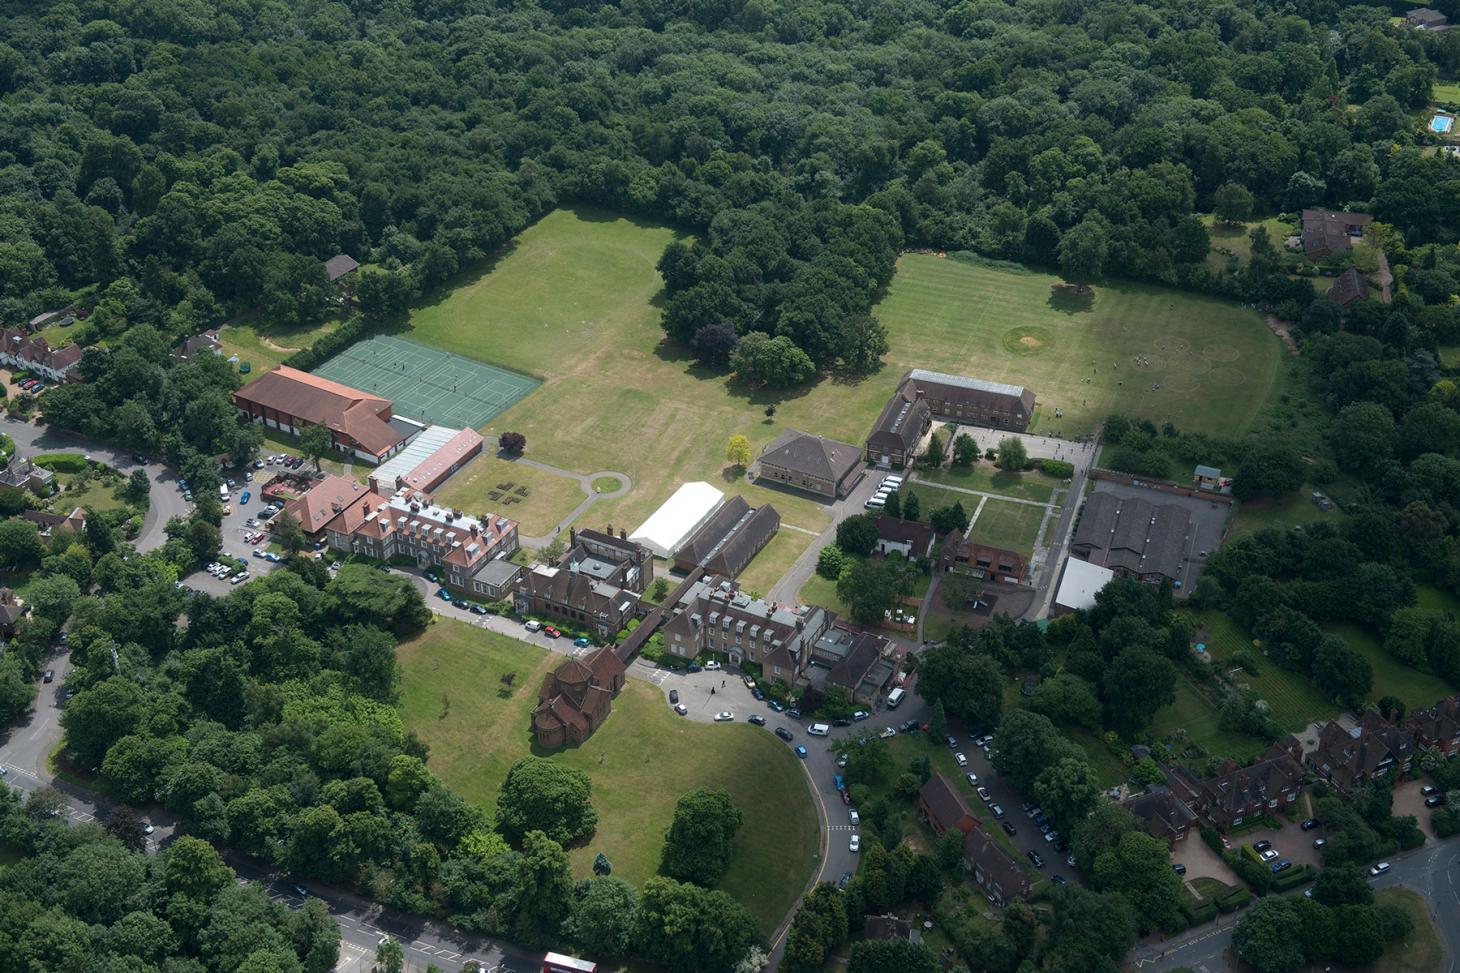 Farringtons School Outdoor | Hard (macadam) tennis court